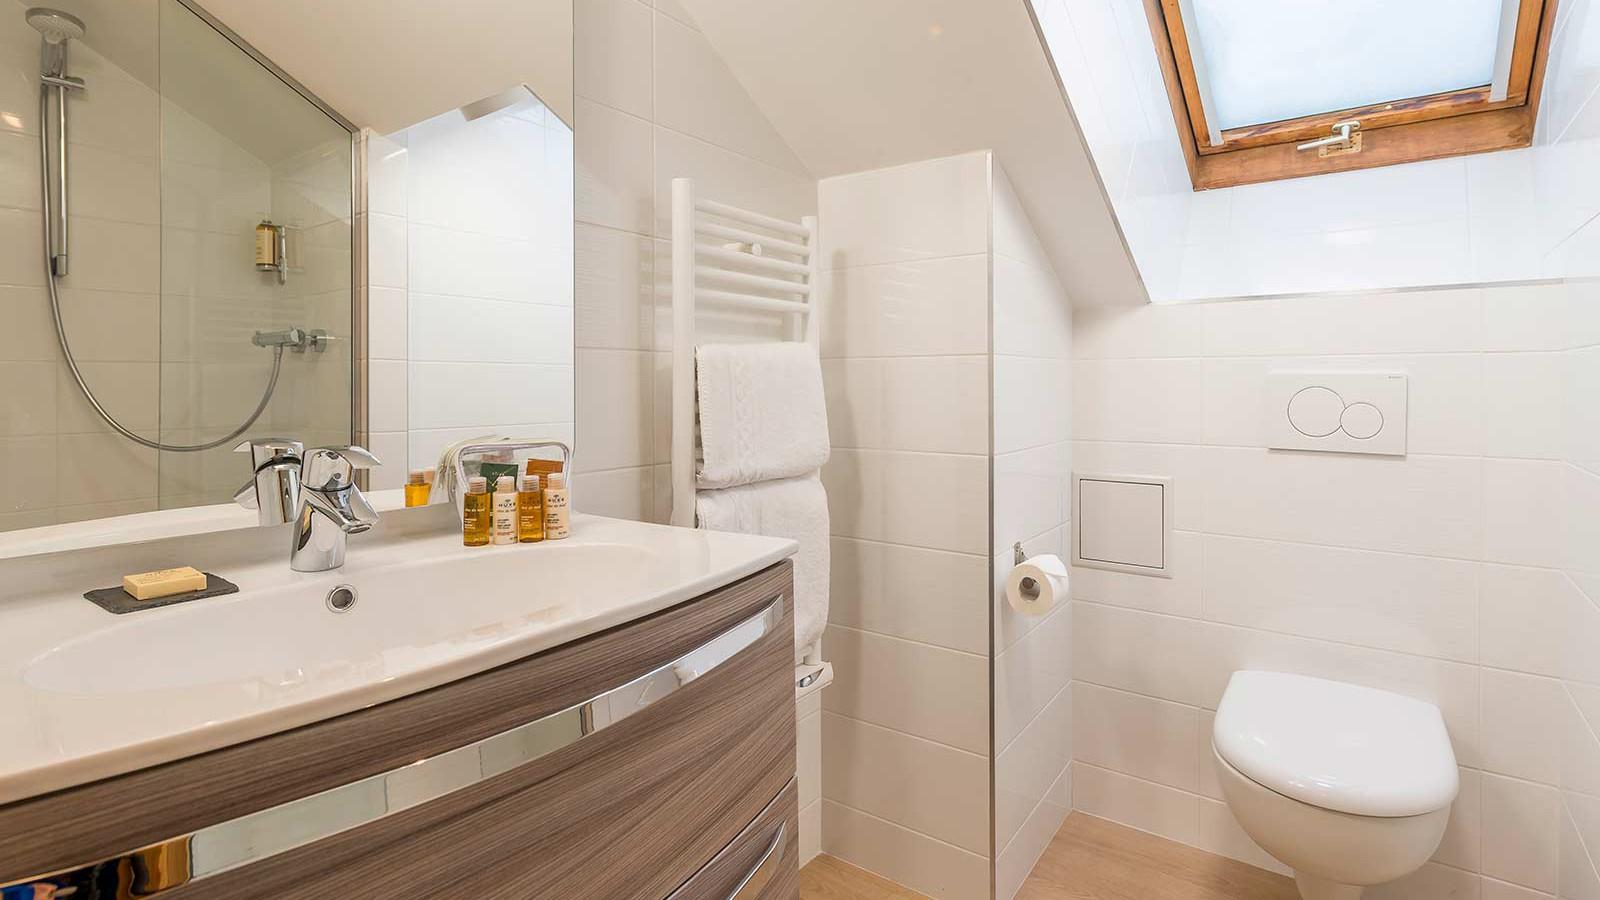 Hotel L'Eterlou, Meribel - Bathroom